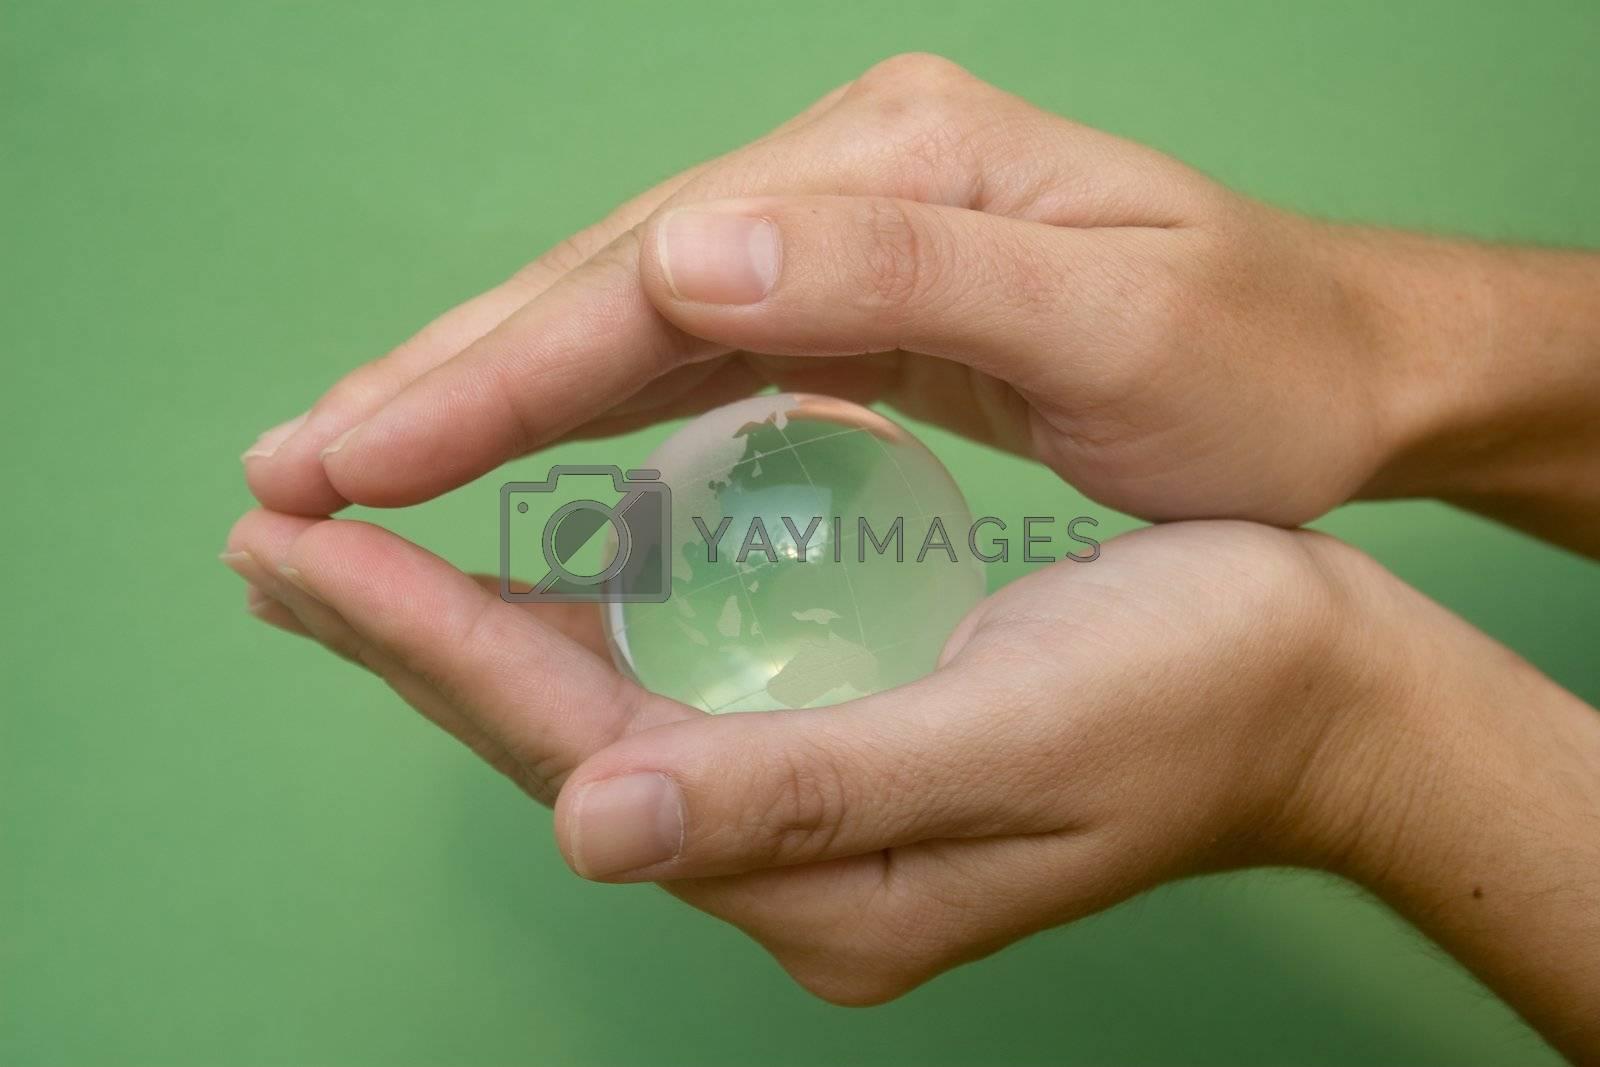 Hands sheltering globe shot against a green background